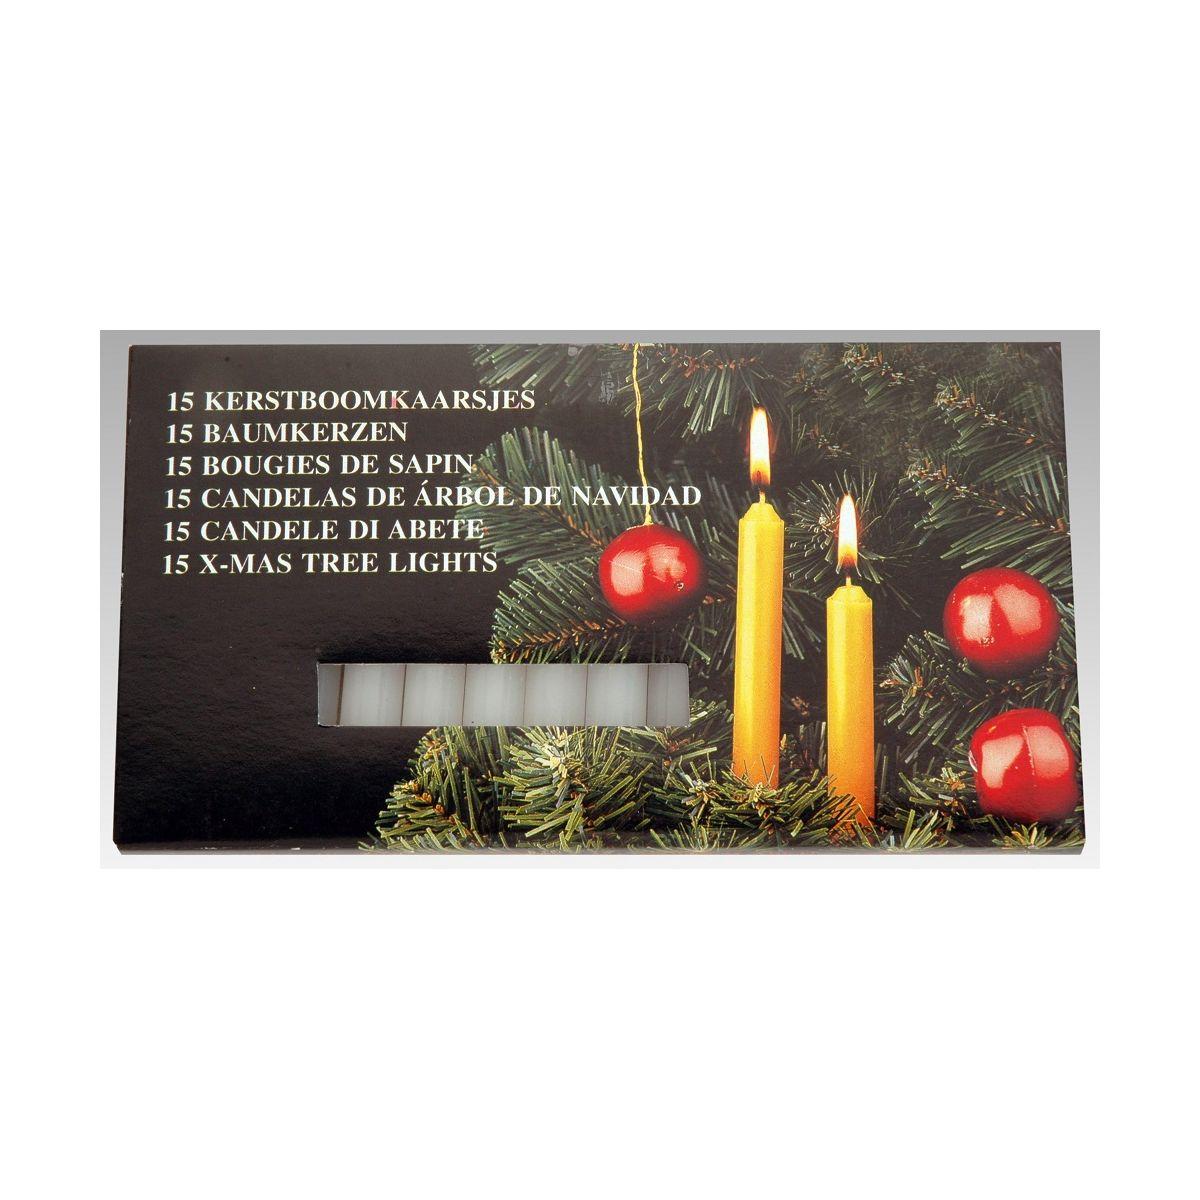 Набор свечей 15 штсвечи набор 15 шт<br>